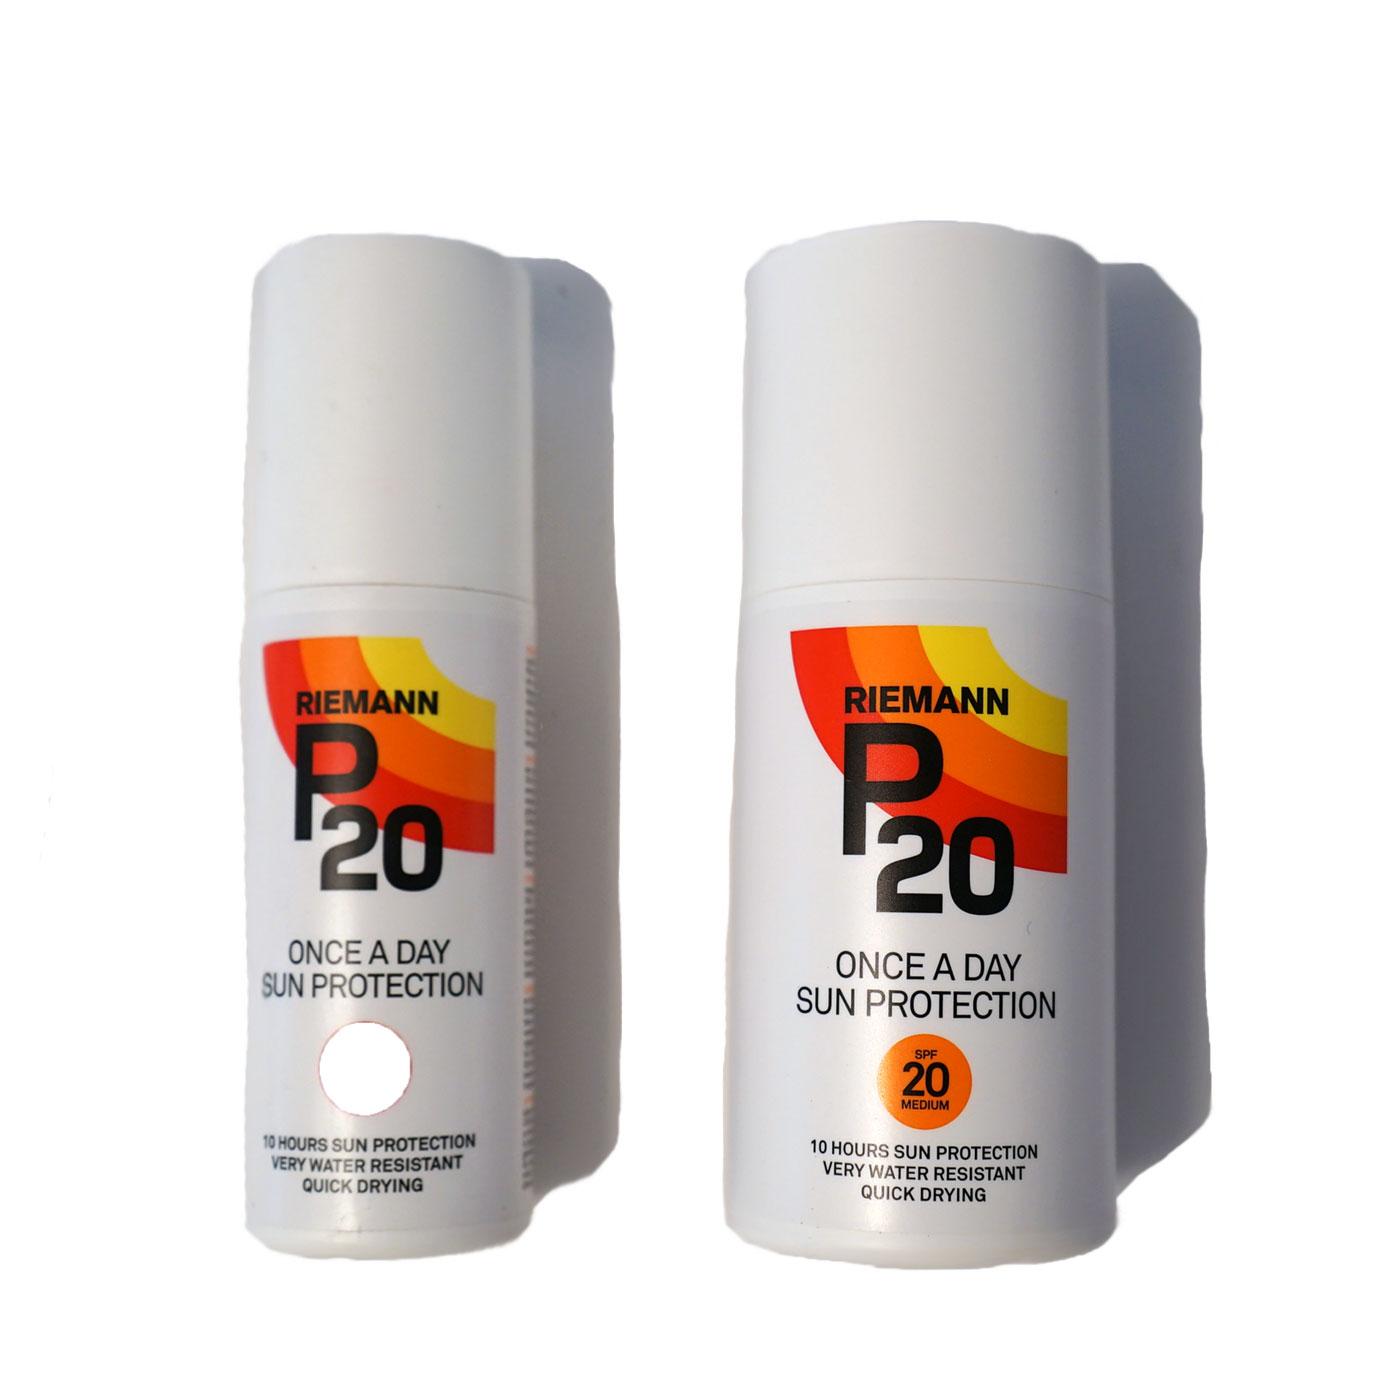 REIMANN P20 • Sun Protection • 30 USD